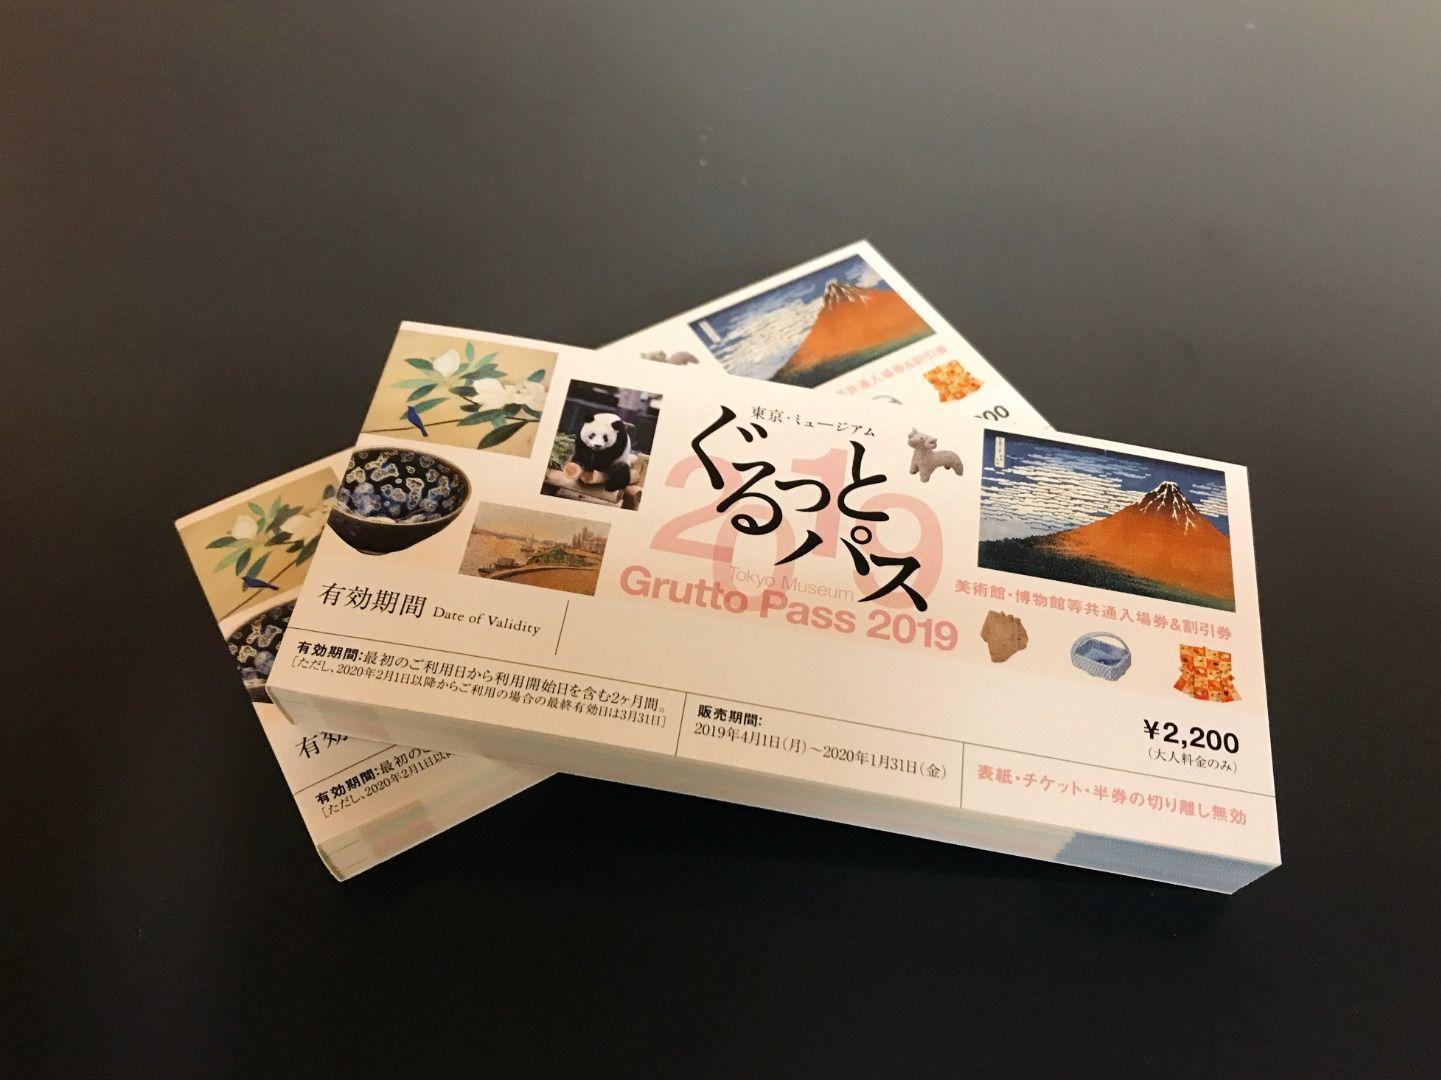 Japan Tokyo Museum Grutto Pass